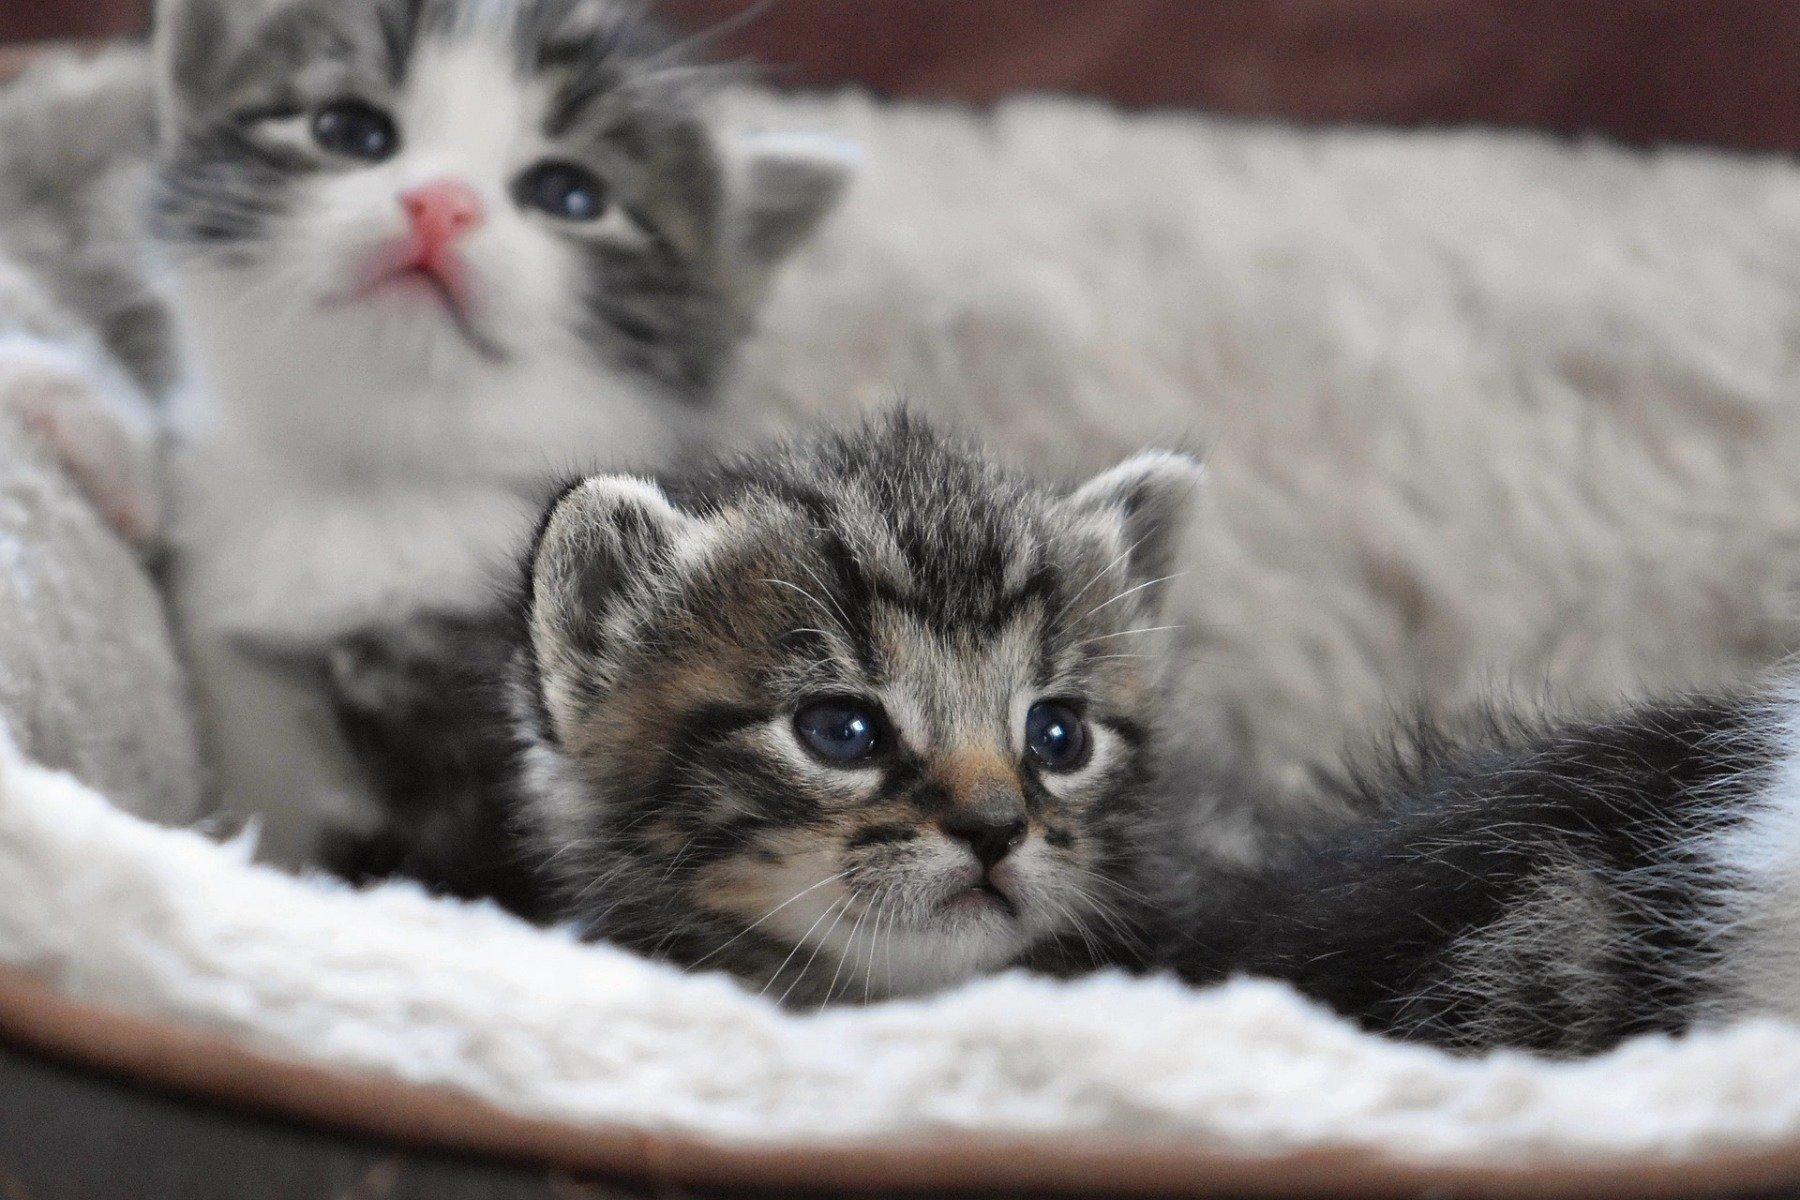 Katzenbabys beim Kuscheln